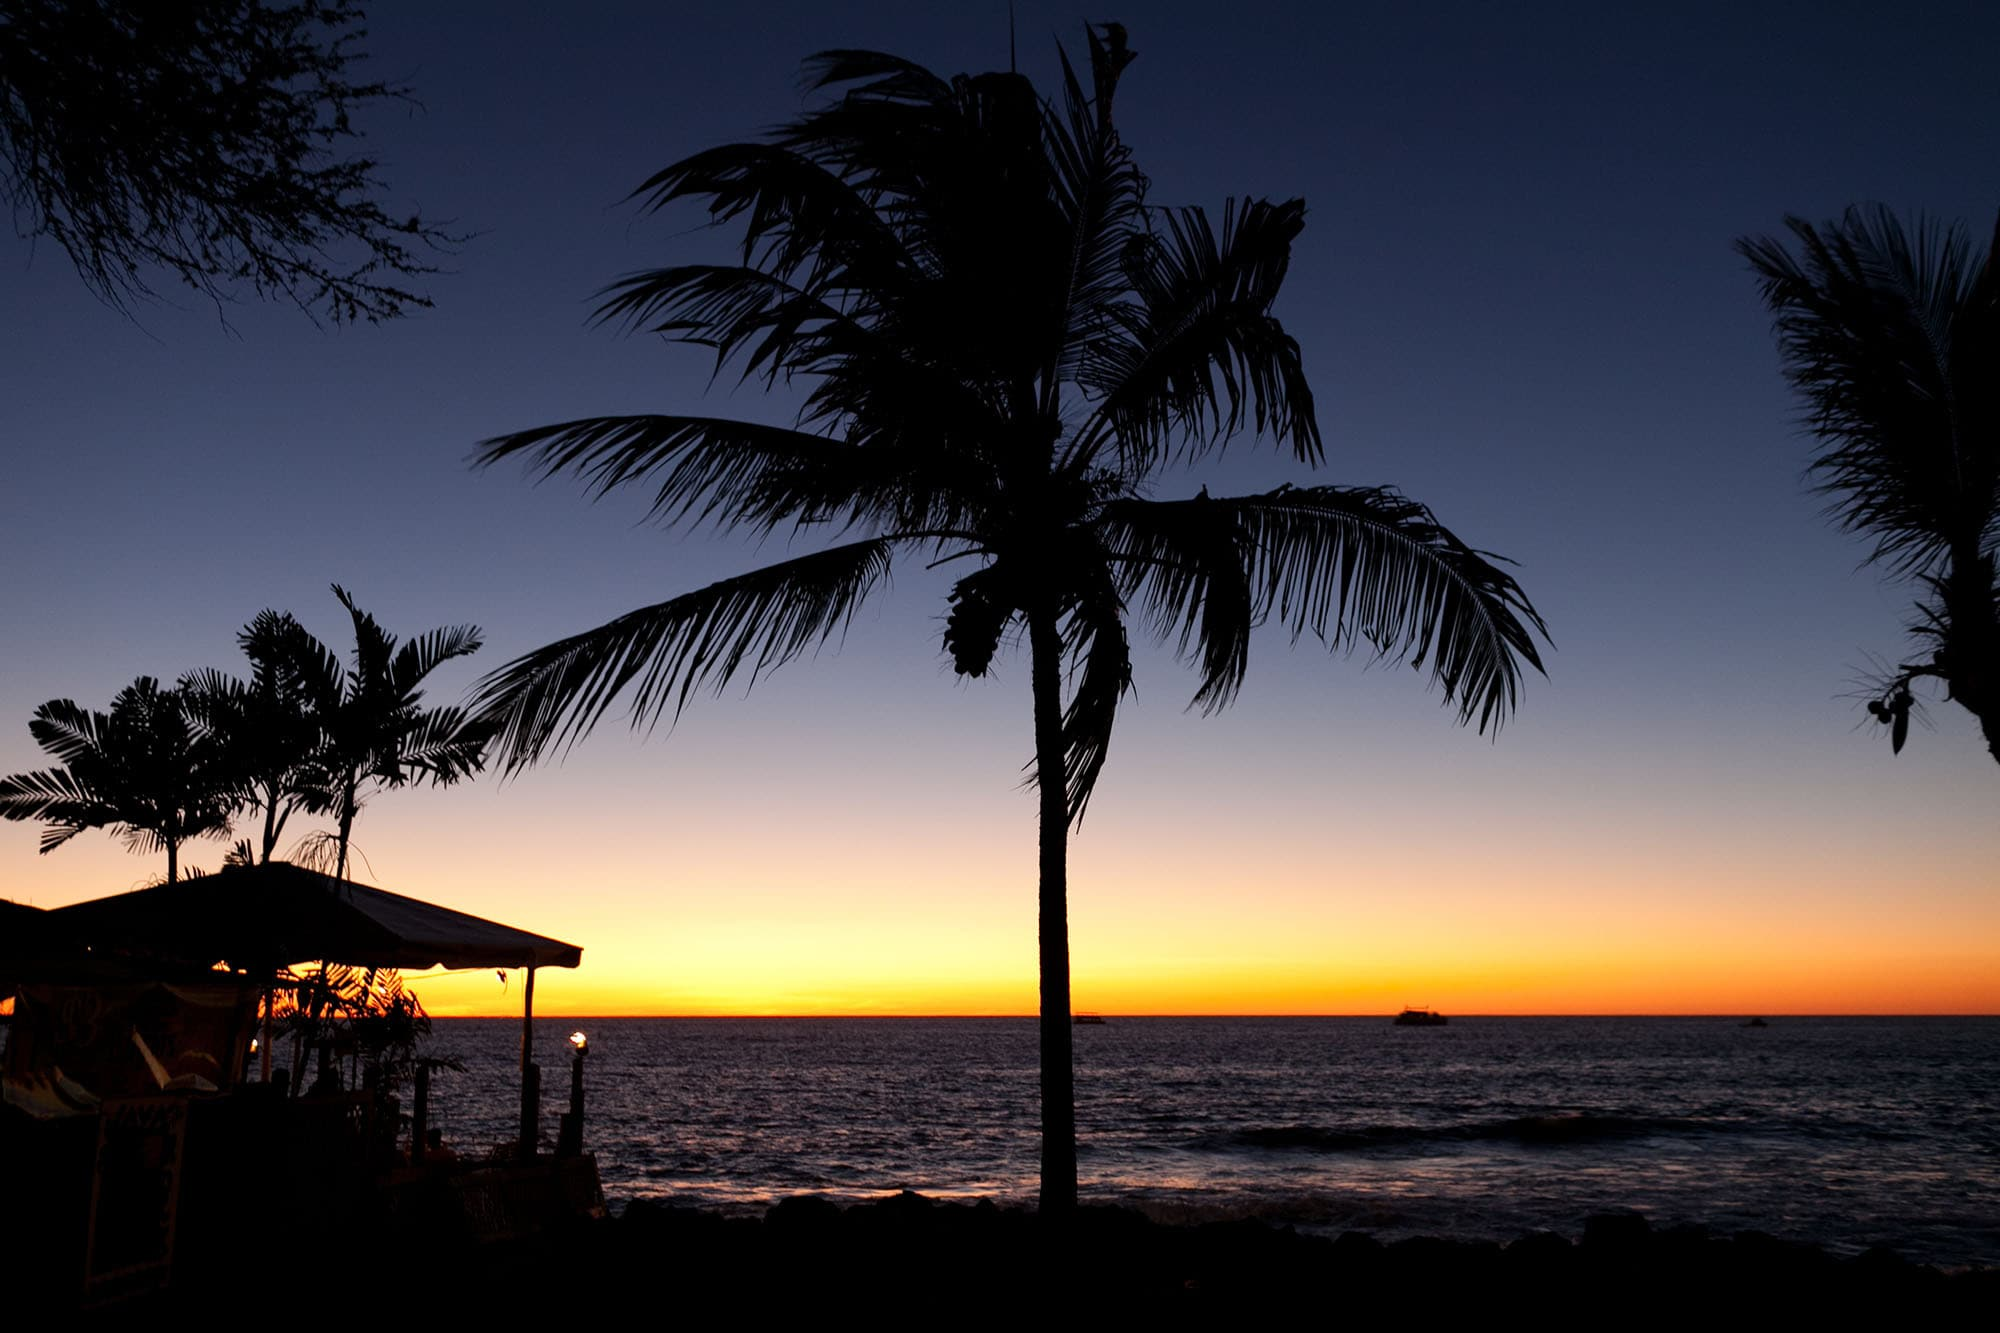 Sunset on the Big Island in Hawaii